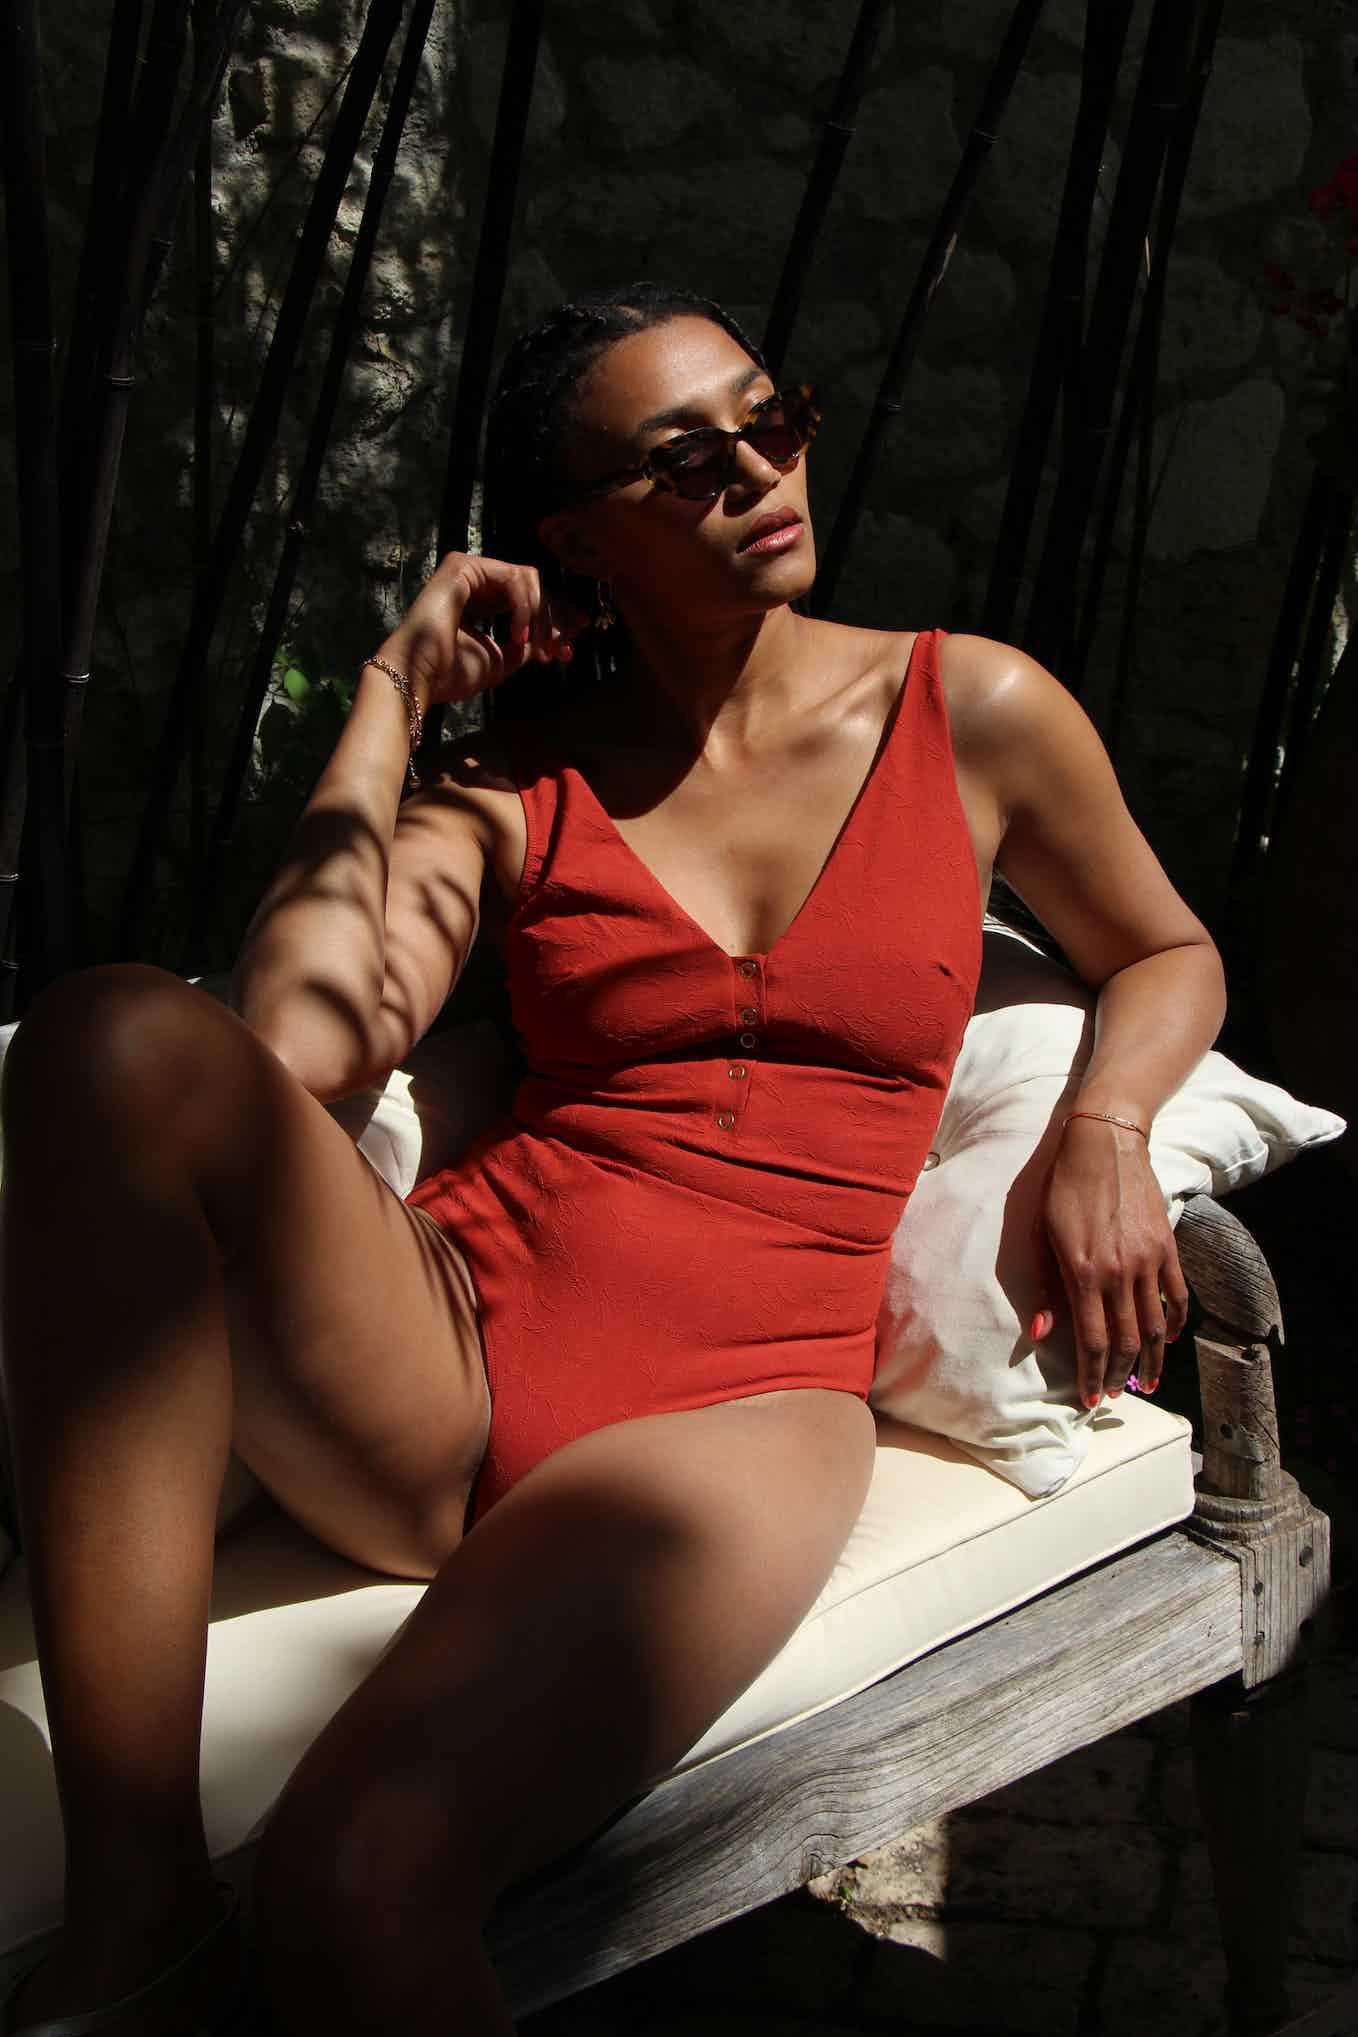 Léna is wearing the swimsuit Partir avec toi in Terracotta